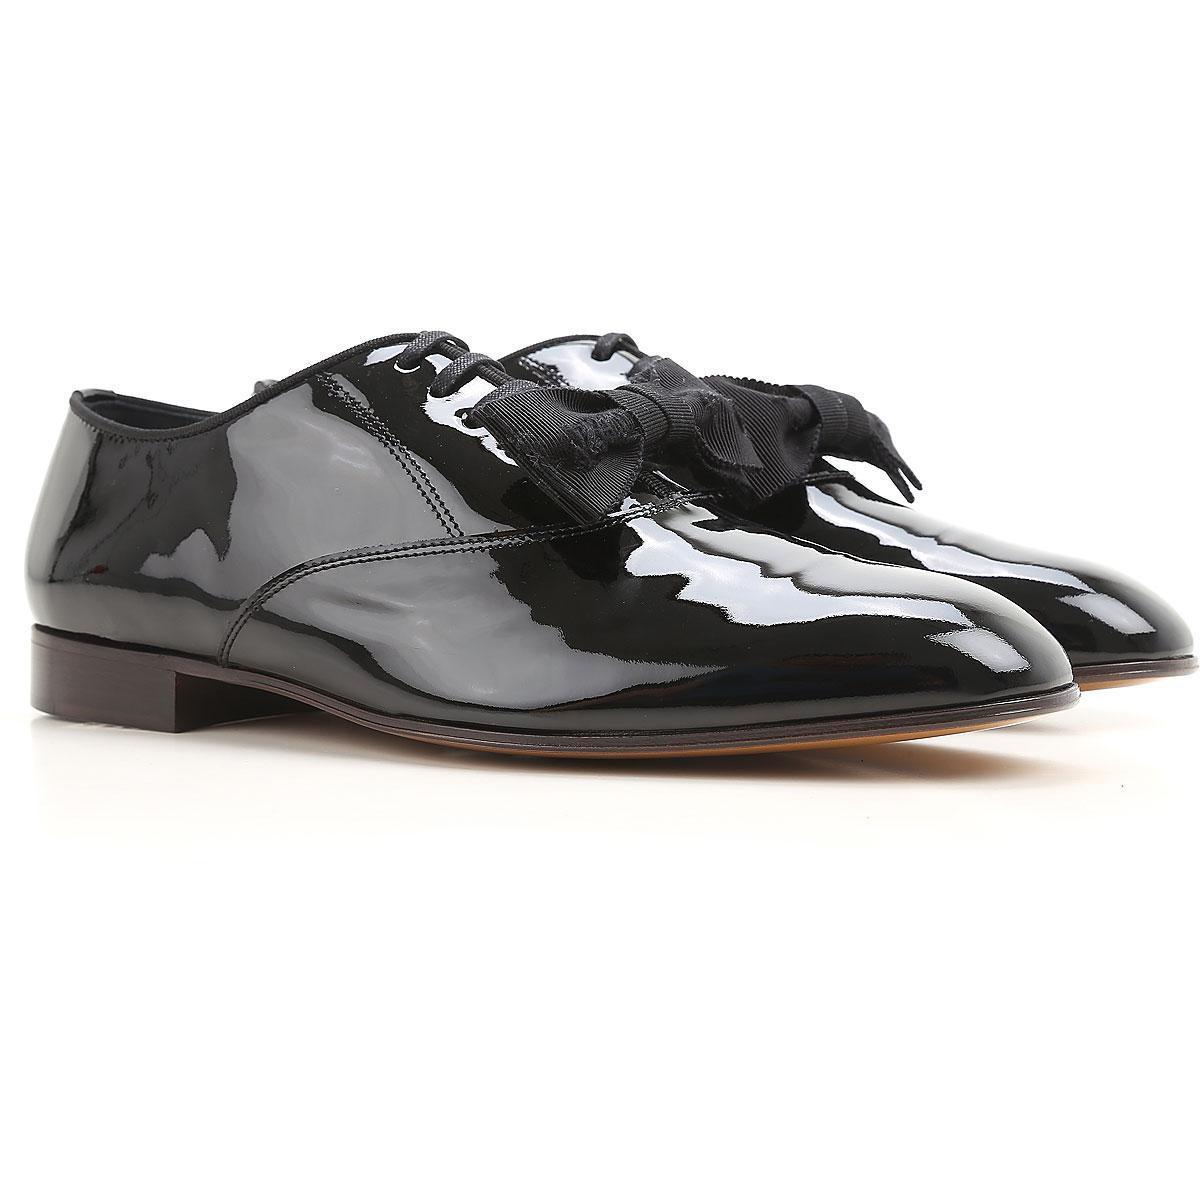 d1d42bc2ff4 Vivienne Westwood Shoes For Men in Black for Men - Lyst